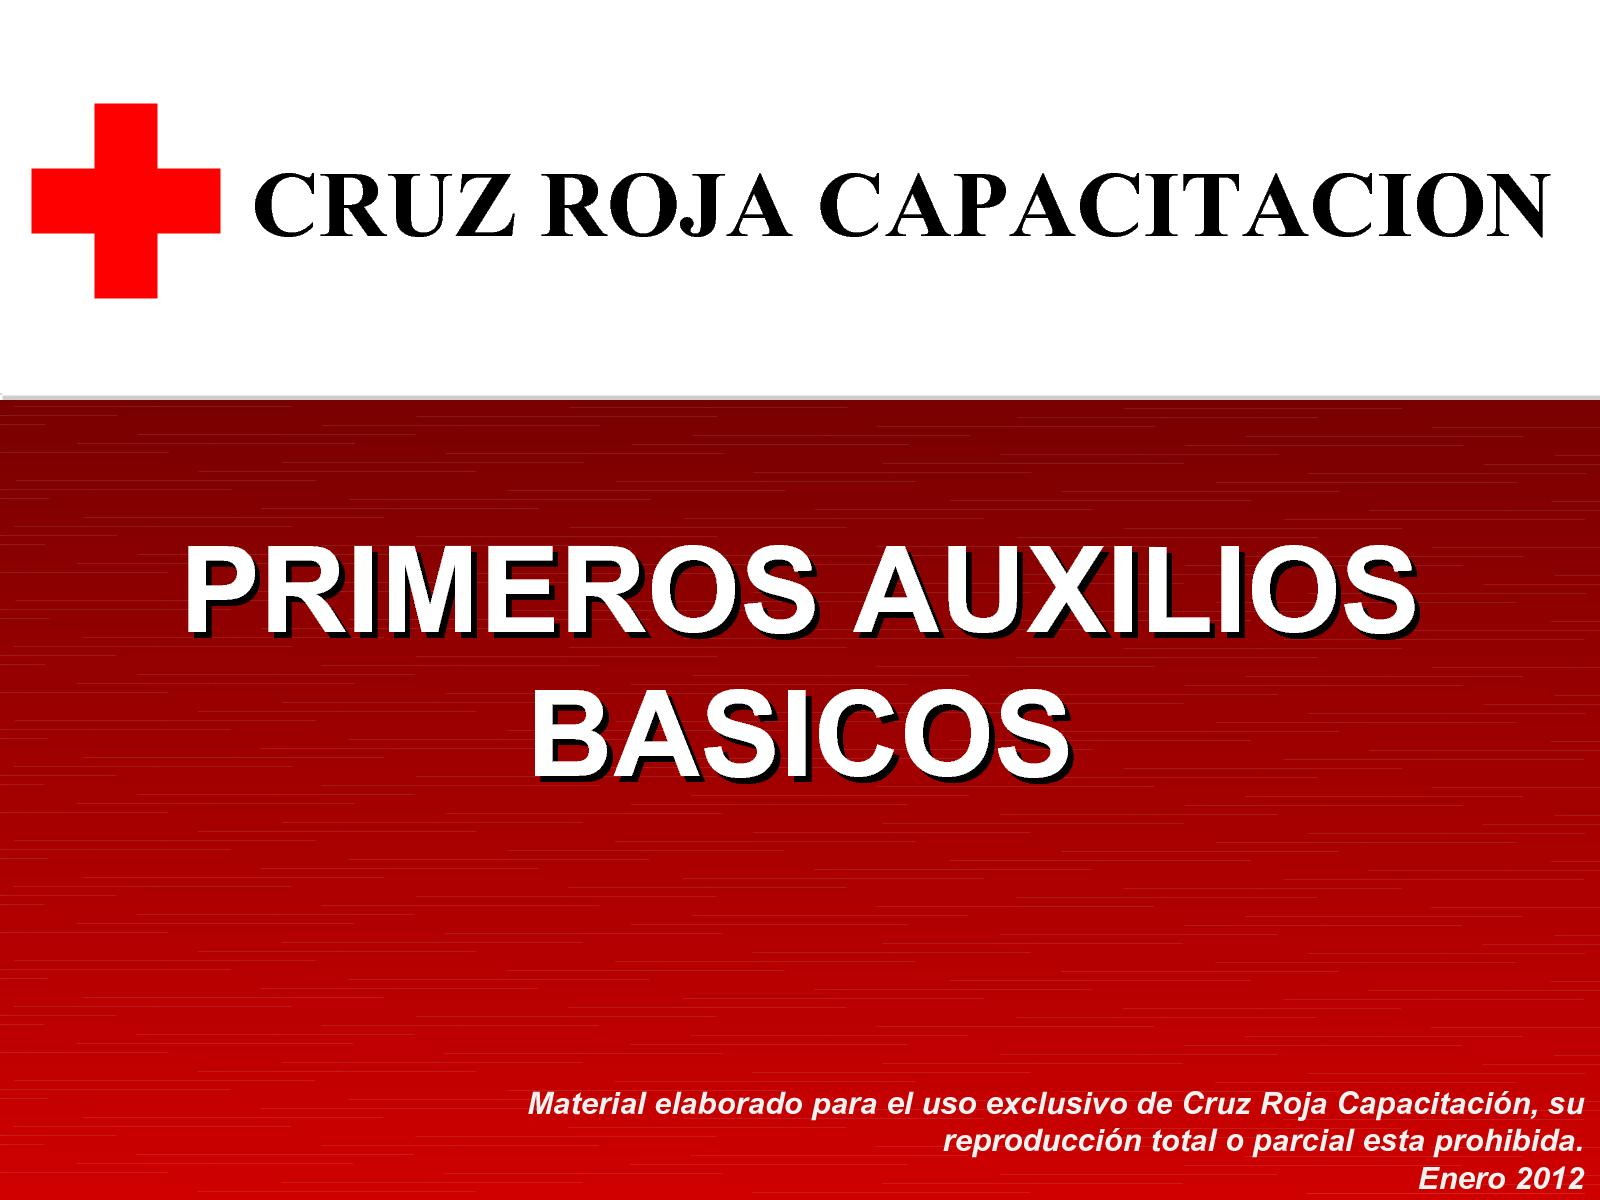 ea5b337e9e1 Calaméo - Manual Primeros Auxilios